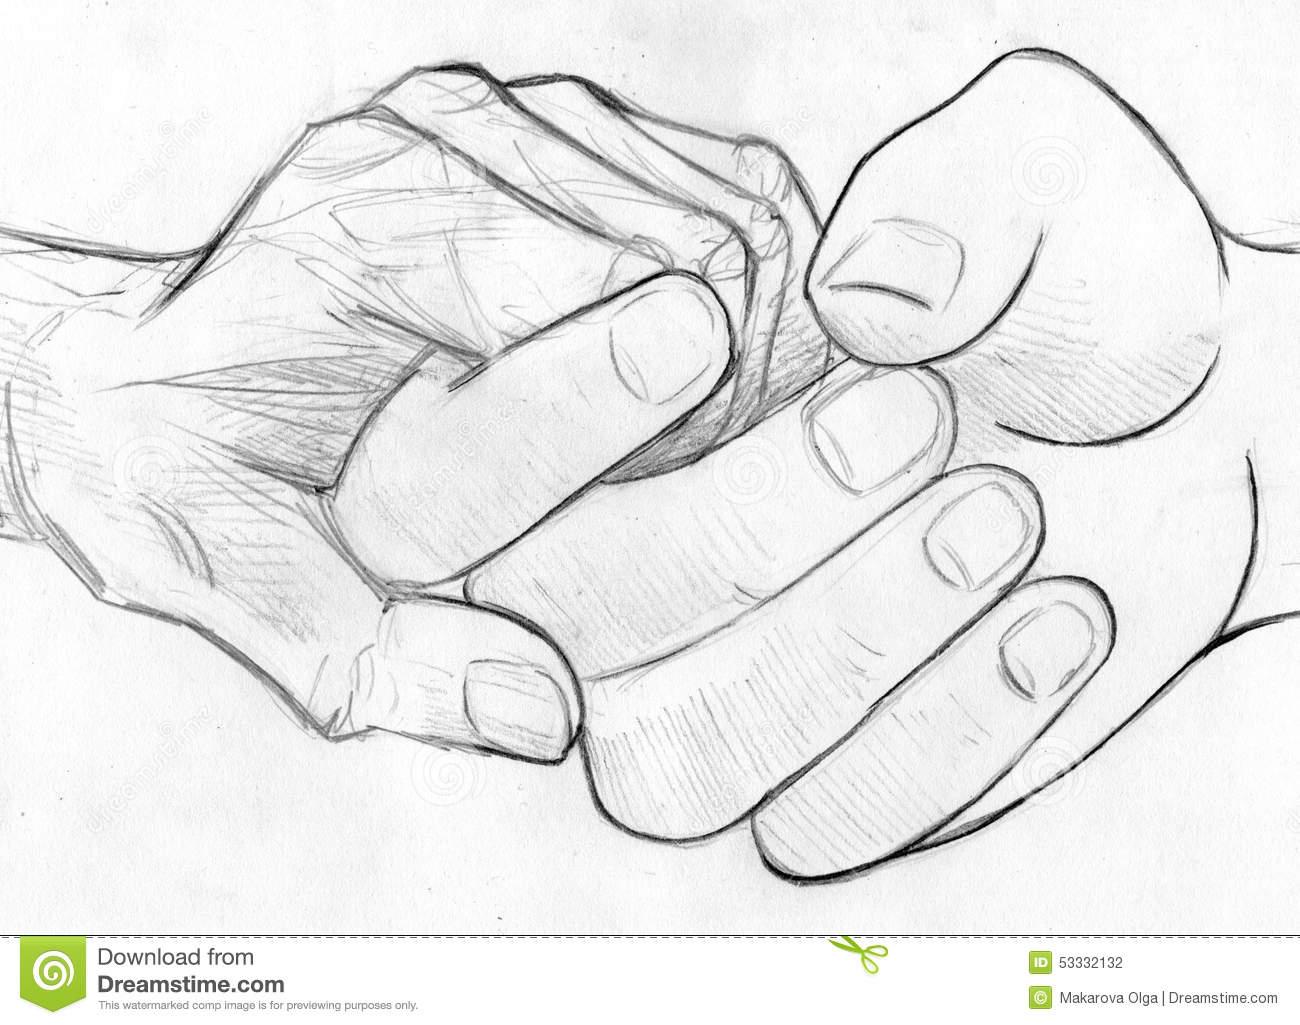 1300x1025 Hand Pencil Sketch Holding Elderly Hand